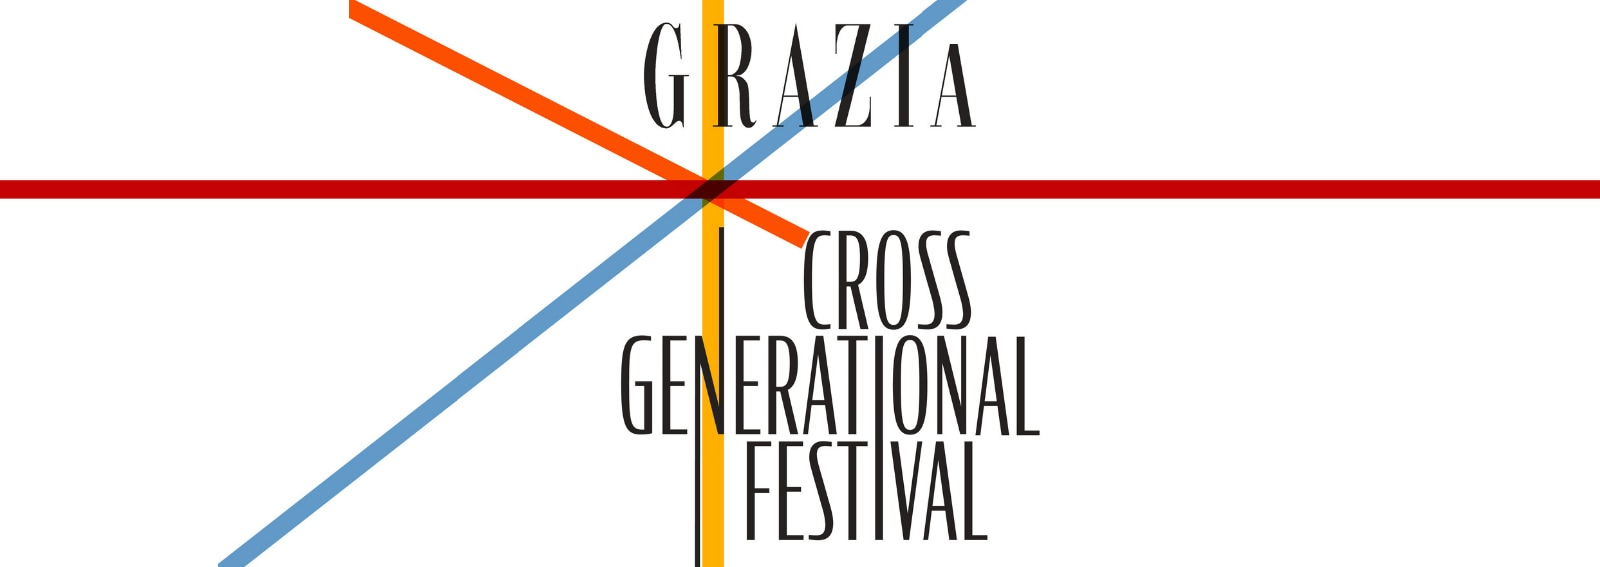 Cross Generation Festival DESK